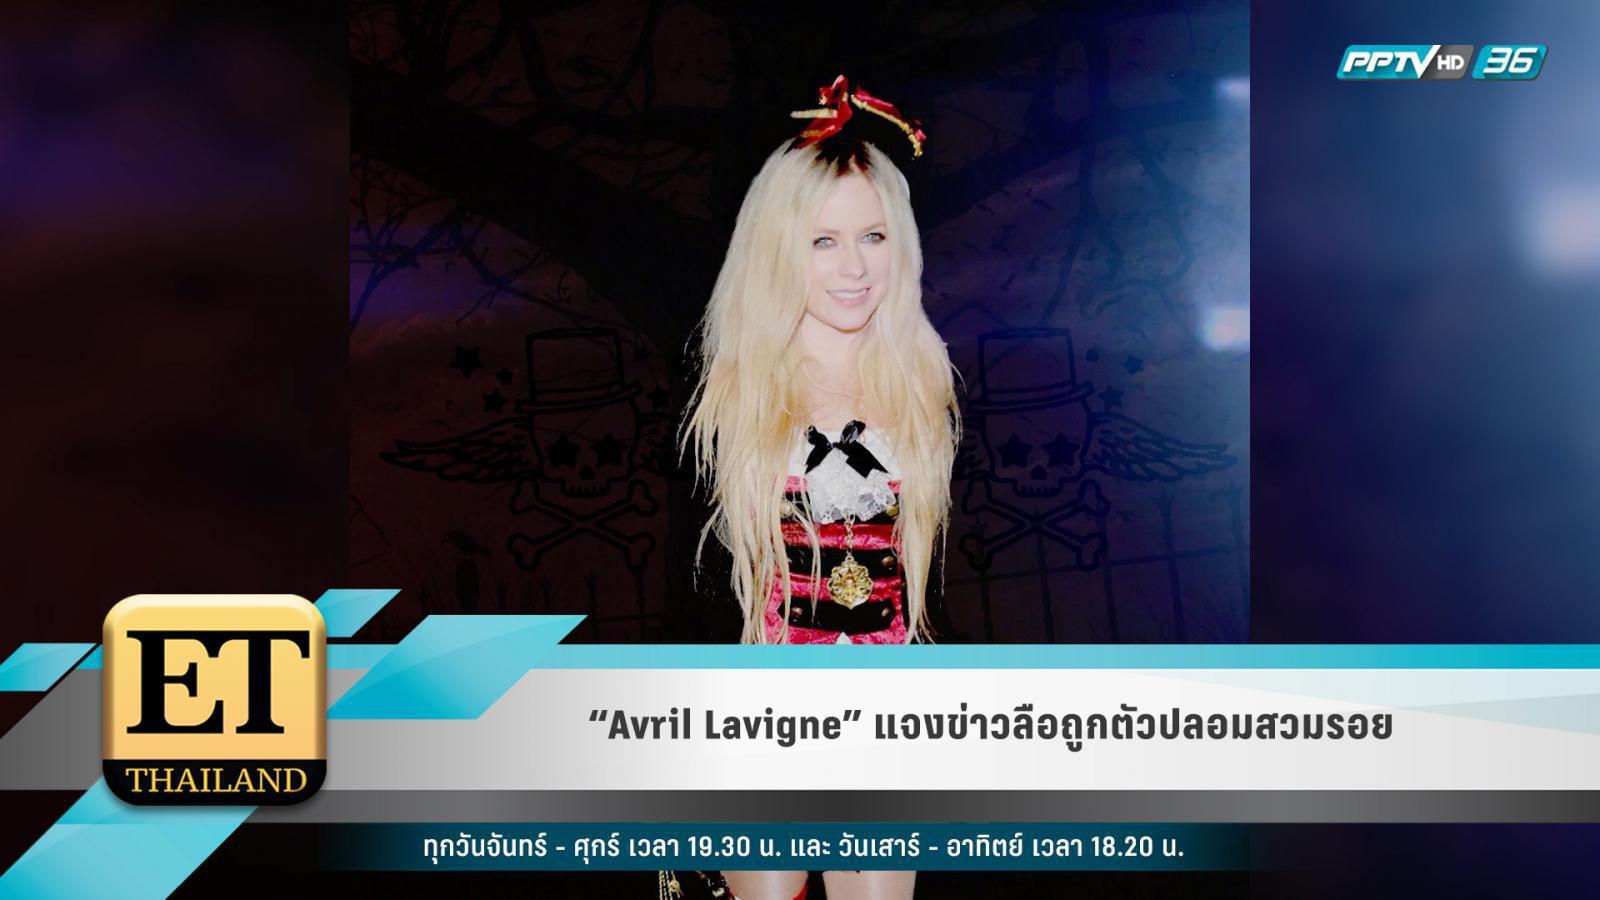 """Avril Lavigne"" แจงข่าวลือถูกตัวปลอมสวมรอย"